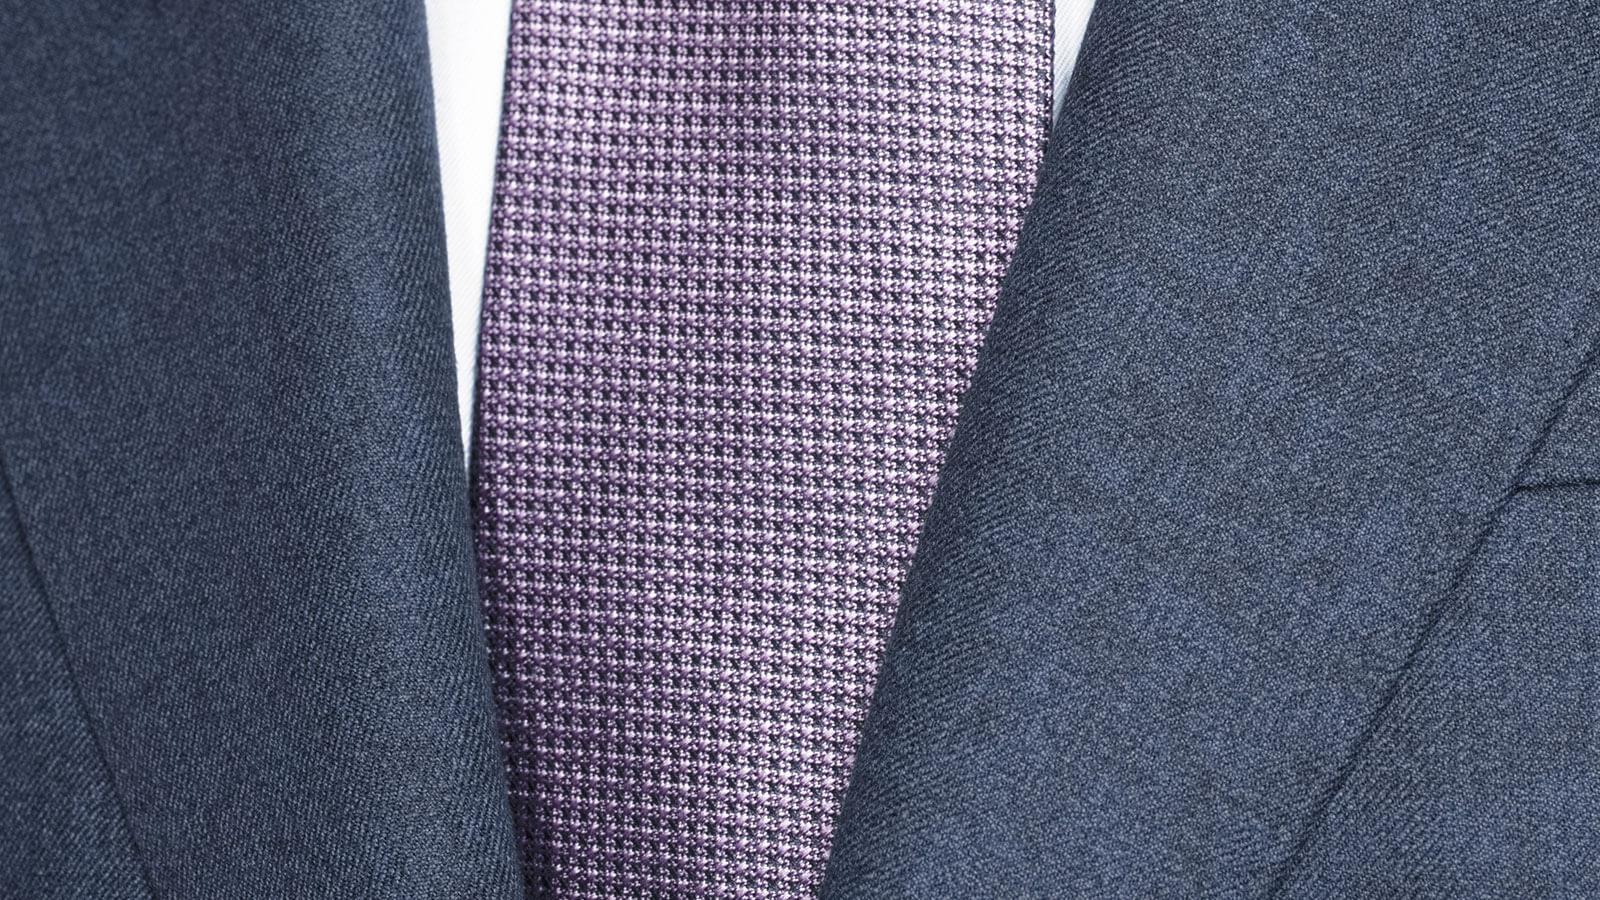 Worsted Chine Intense Blue Suit - slider image 1